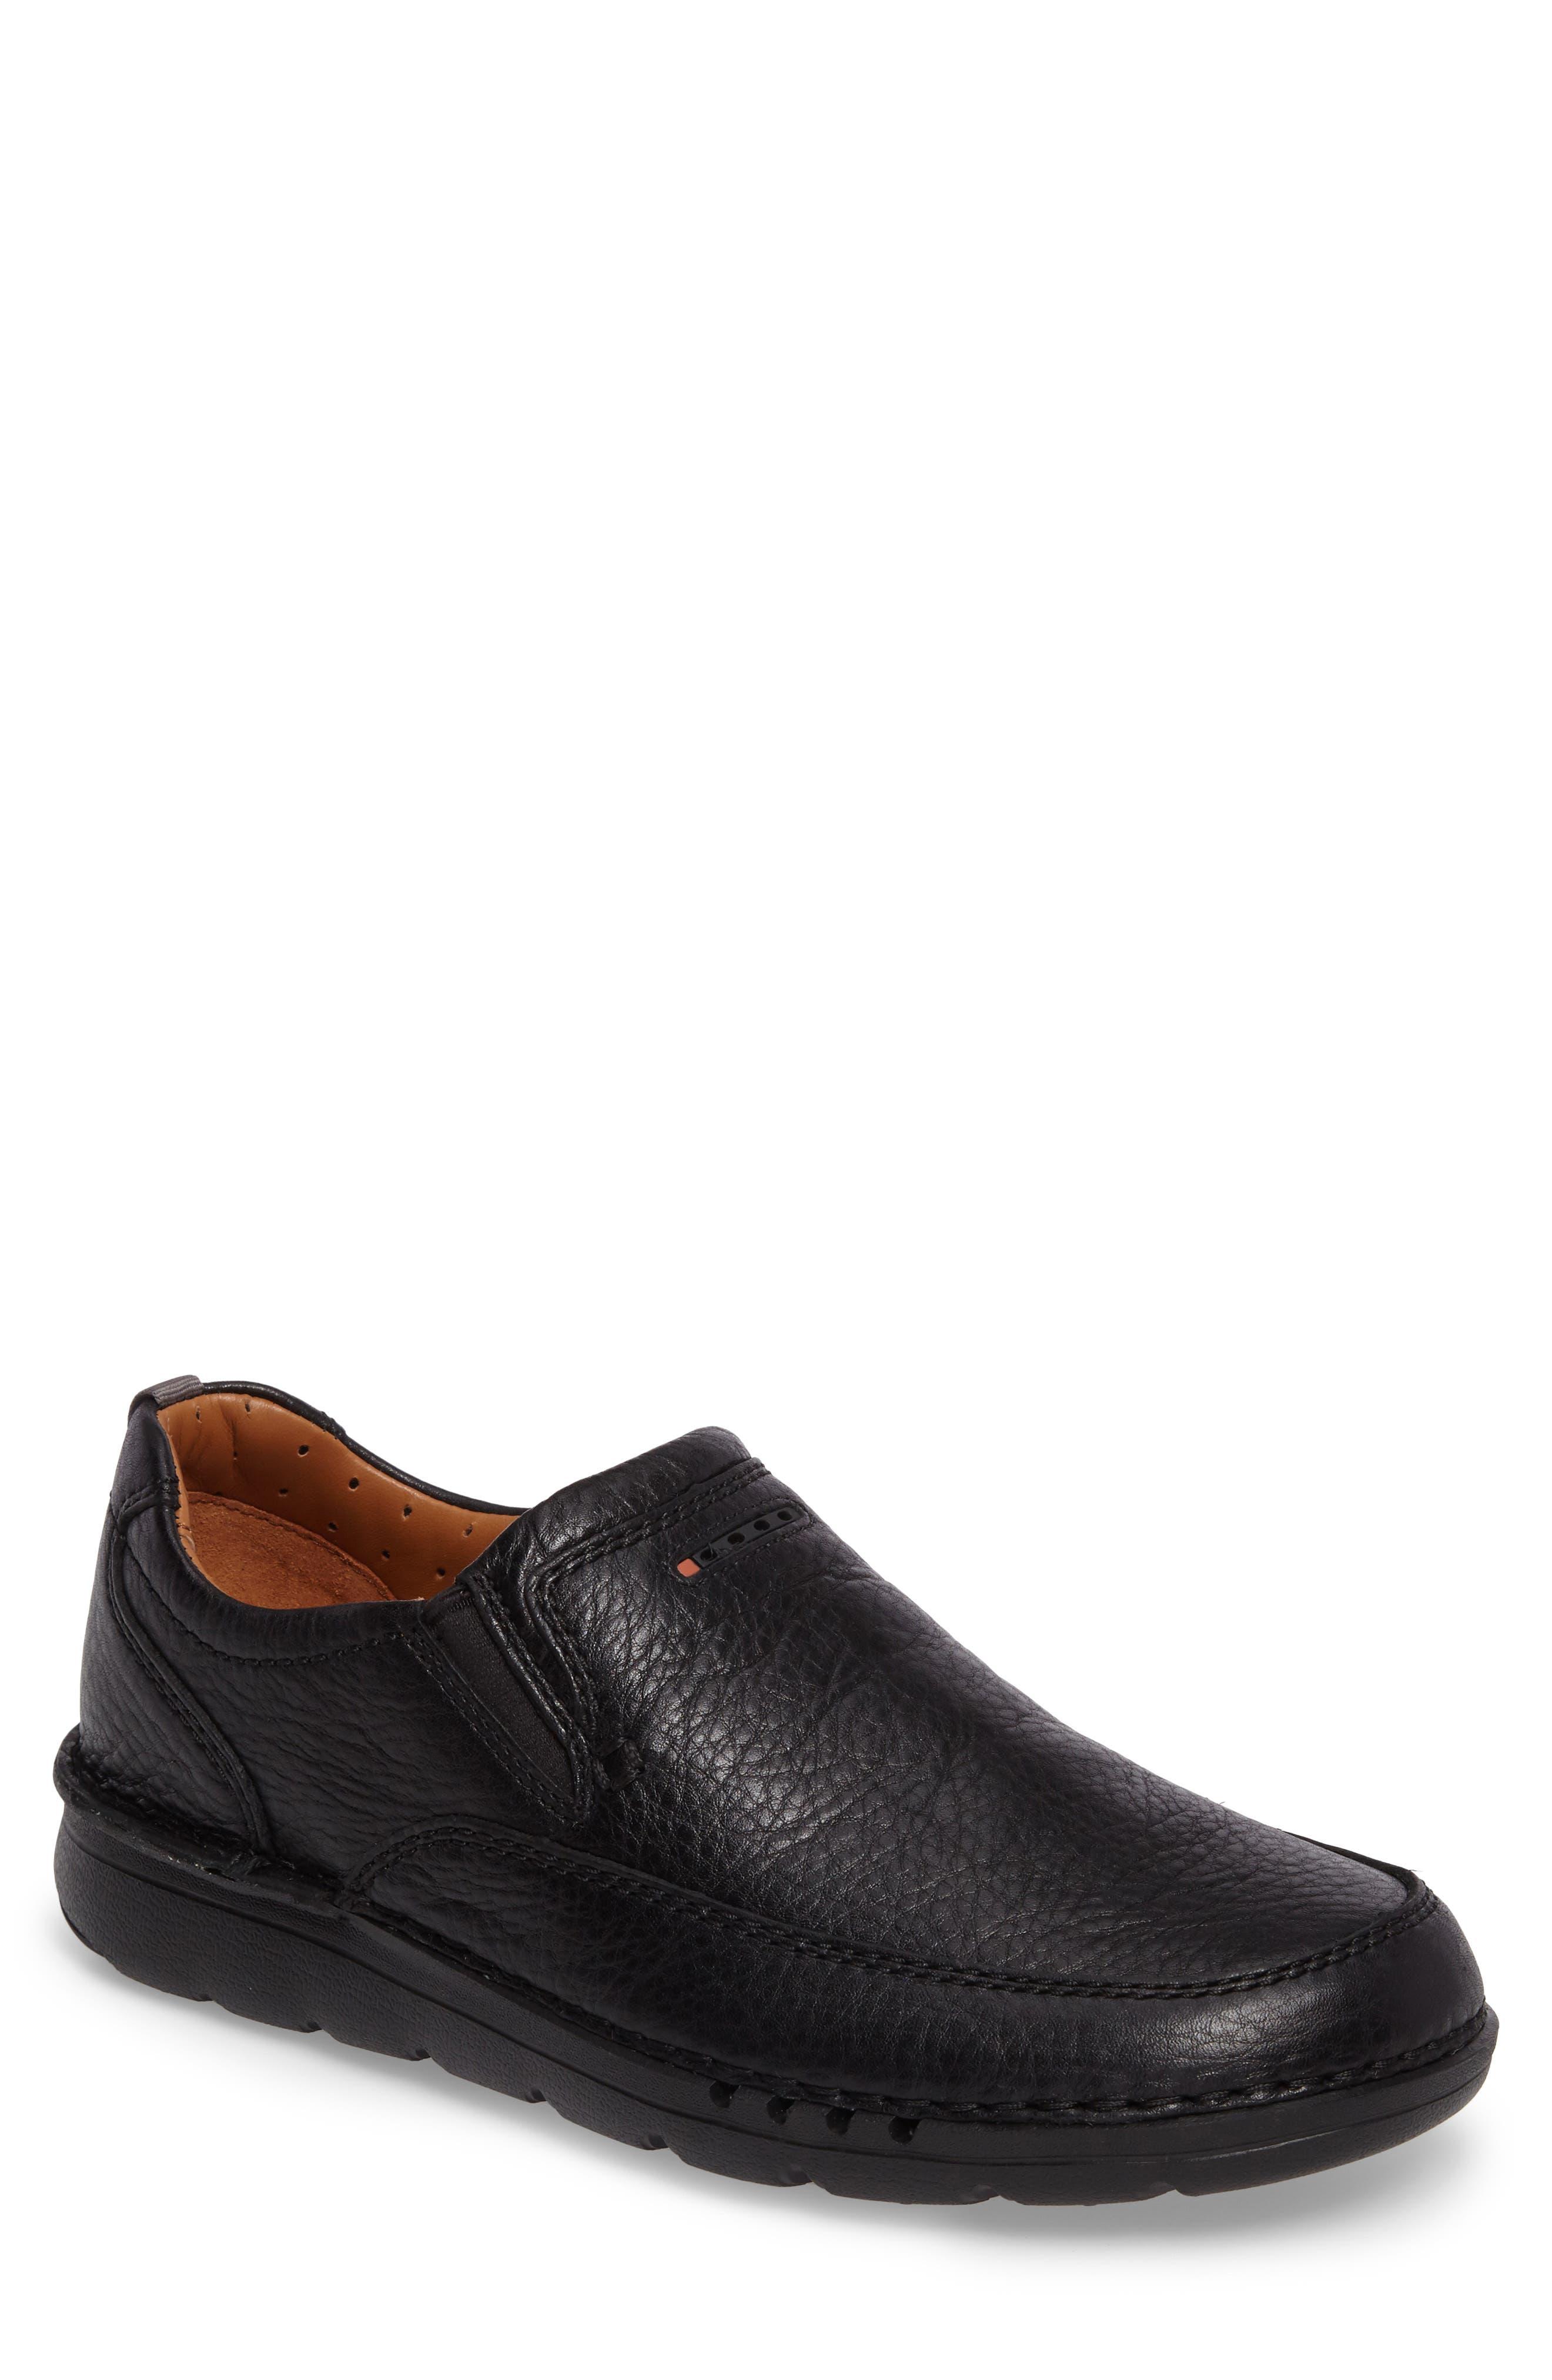 Unnature Easy Slip-On,                         Main,                         color, Black Leather